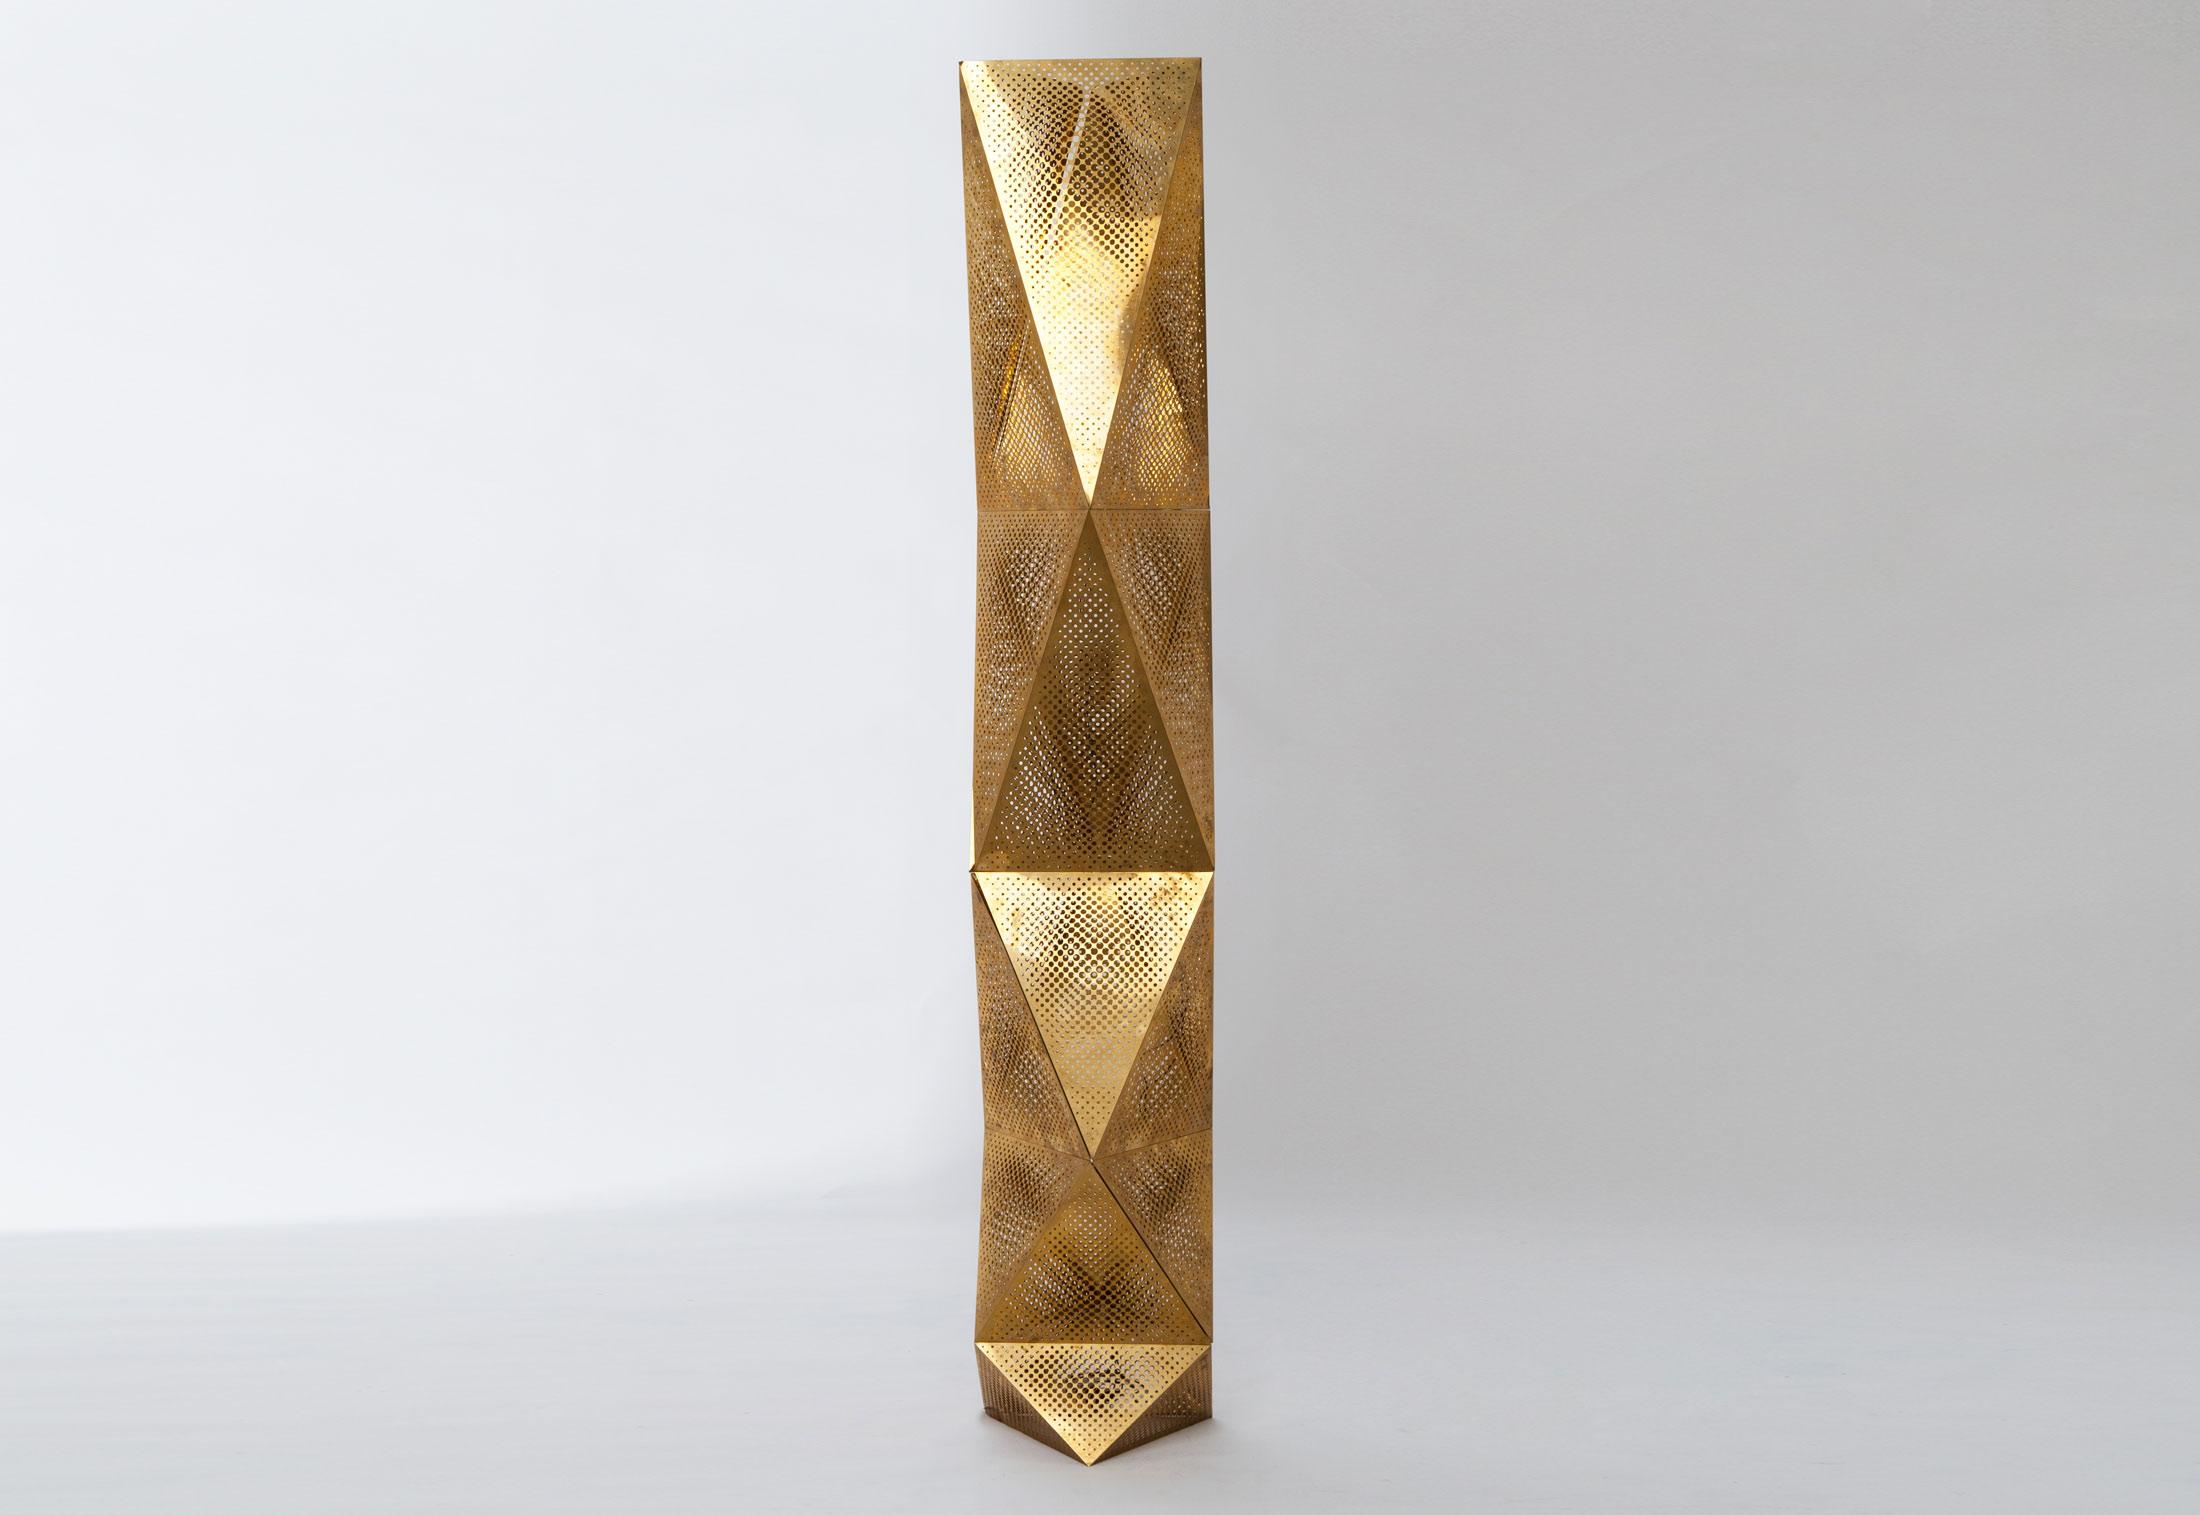 etch tower by tom dixon stylepark. Black Bedroom Furniture Sets. Home Design Ideas